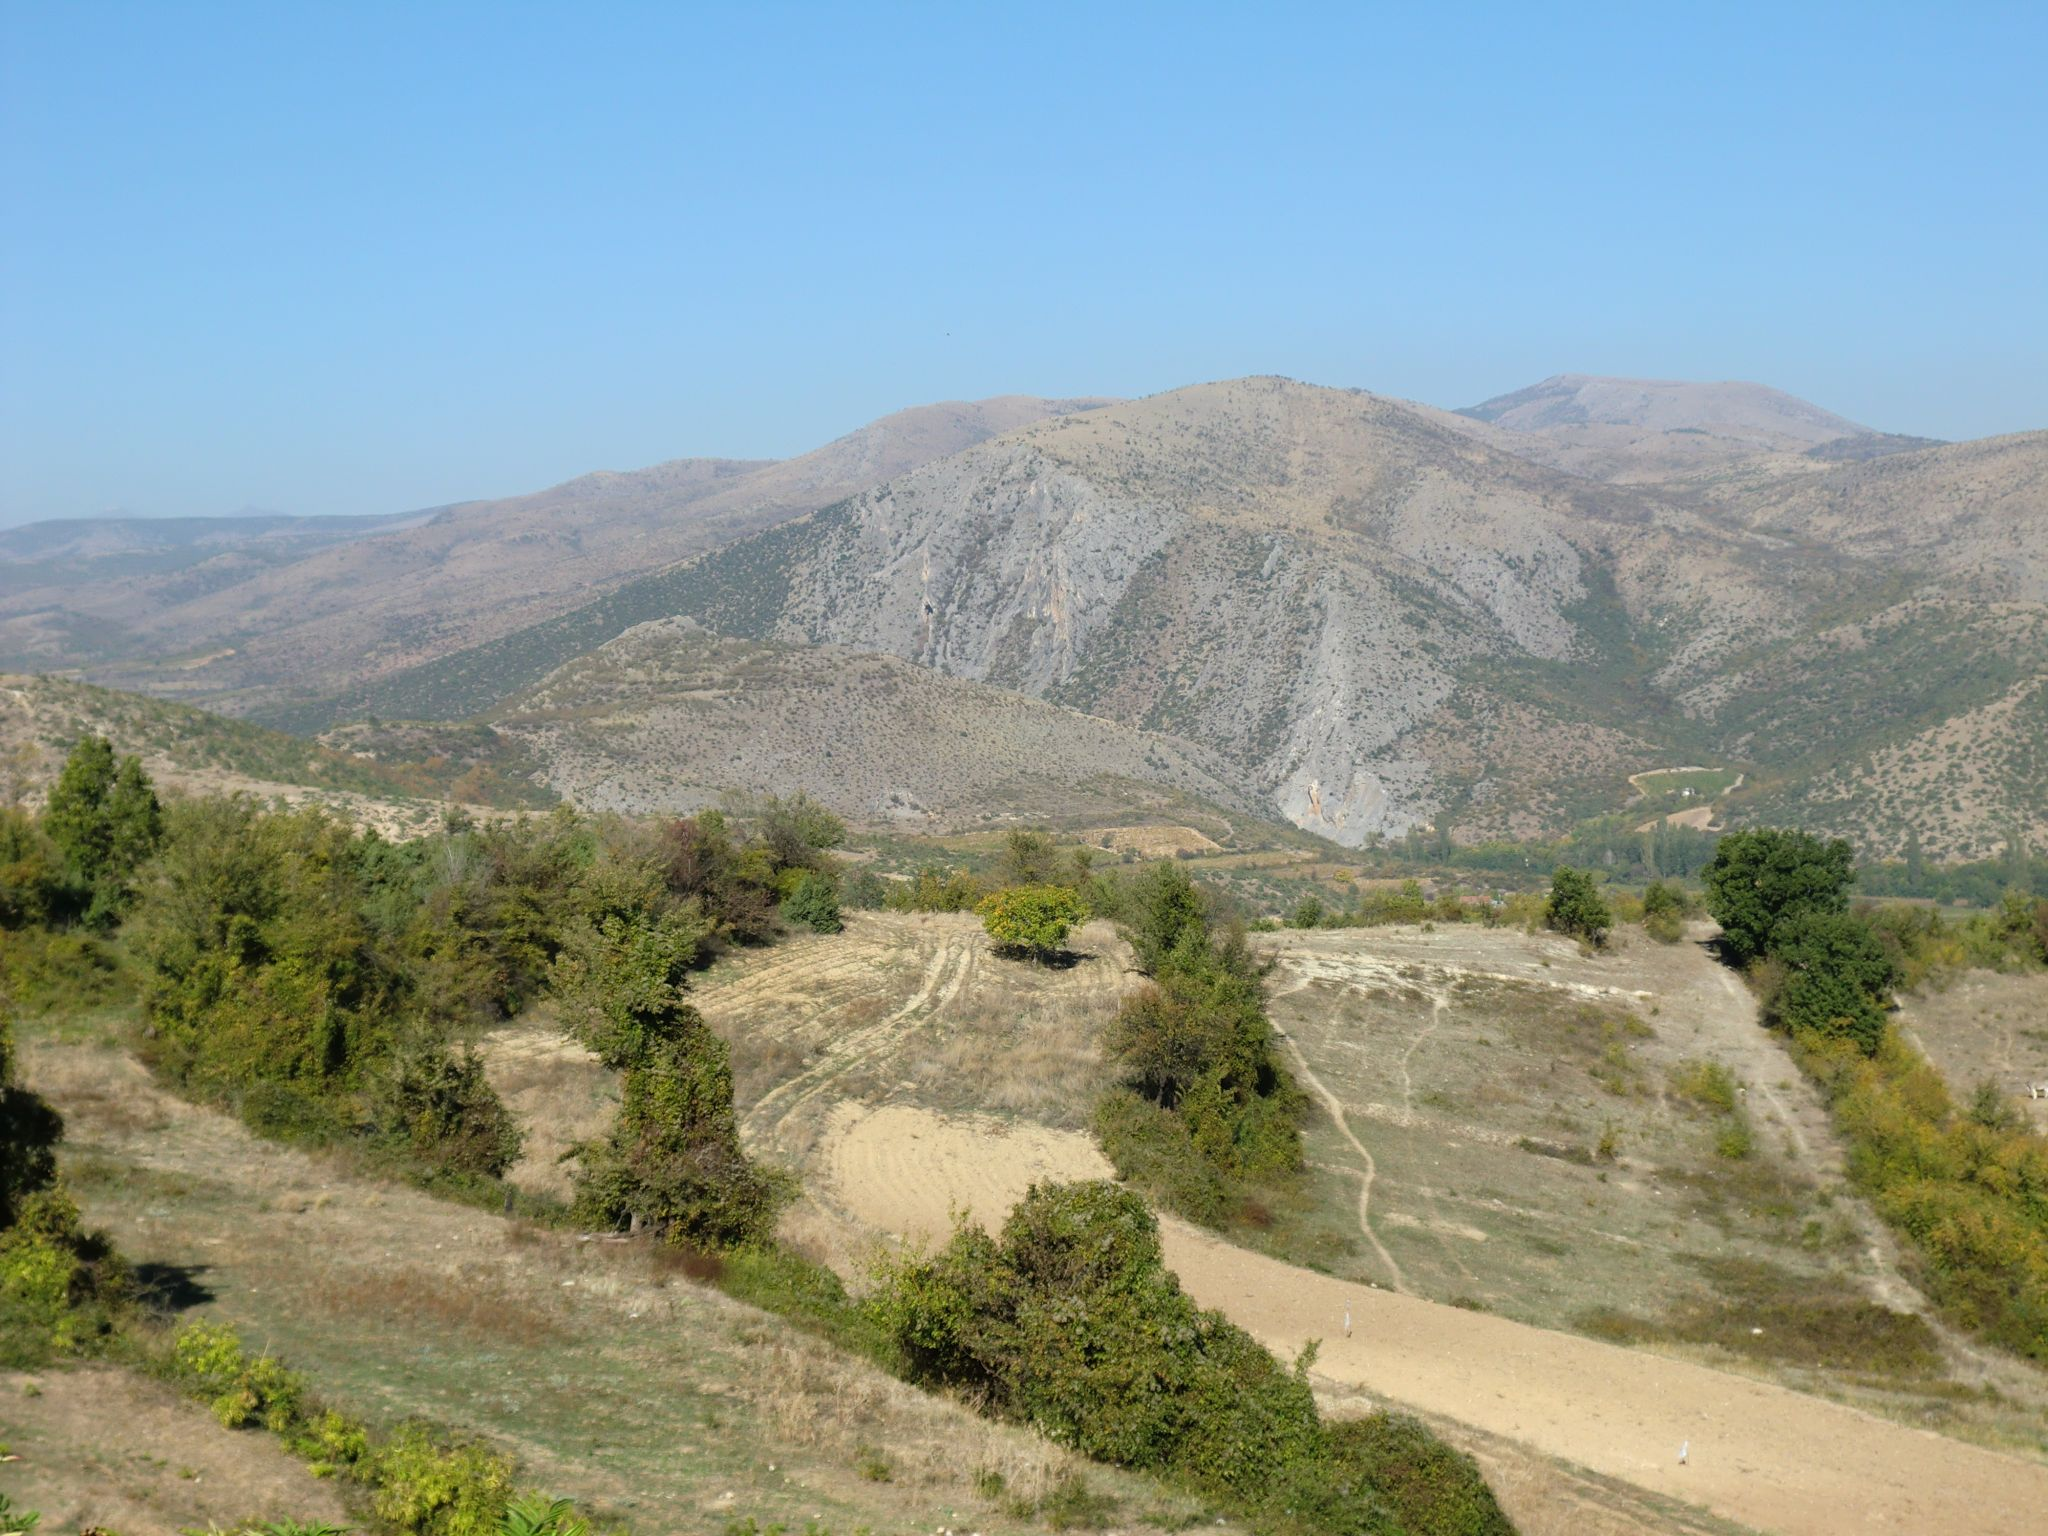 CIMG0138 - Macedonian landscapes